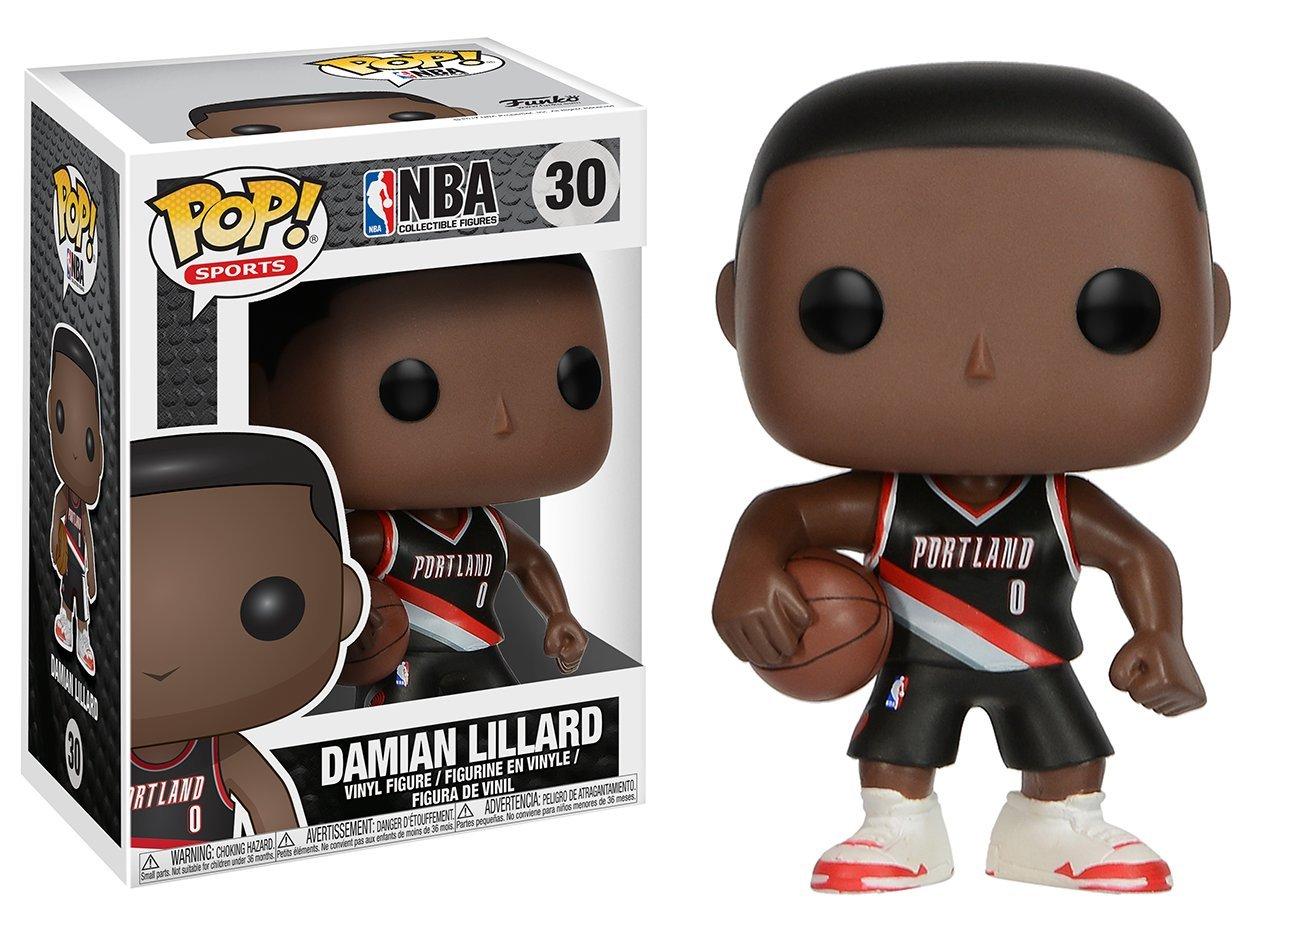 Funko Pop Damian Lillard Portland Trail Blazers camiseta negra (NBA 30) Funko Pop NBA